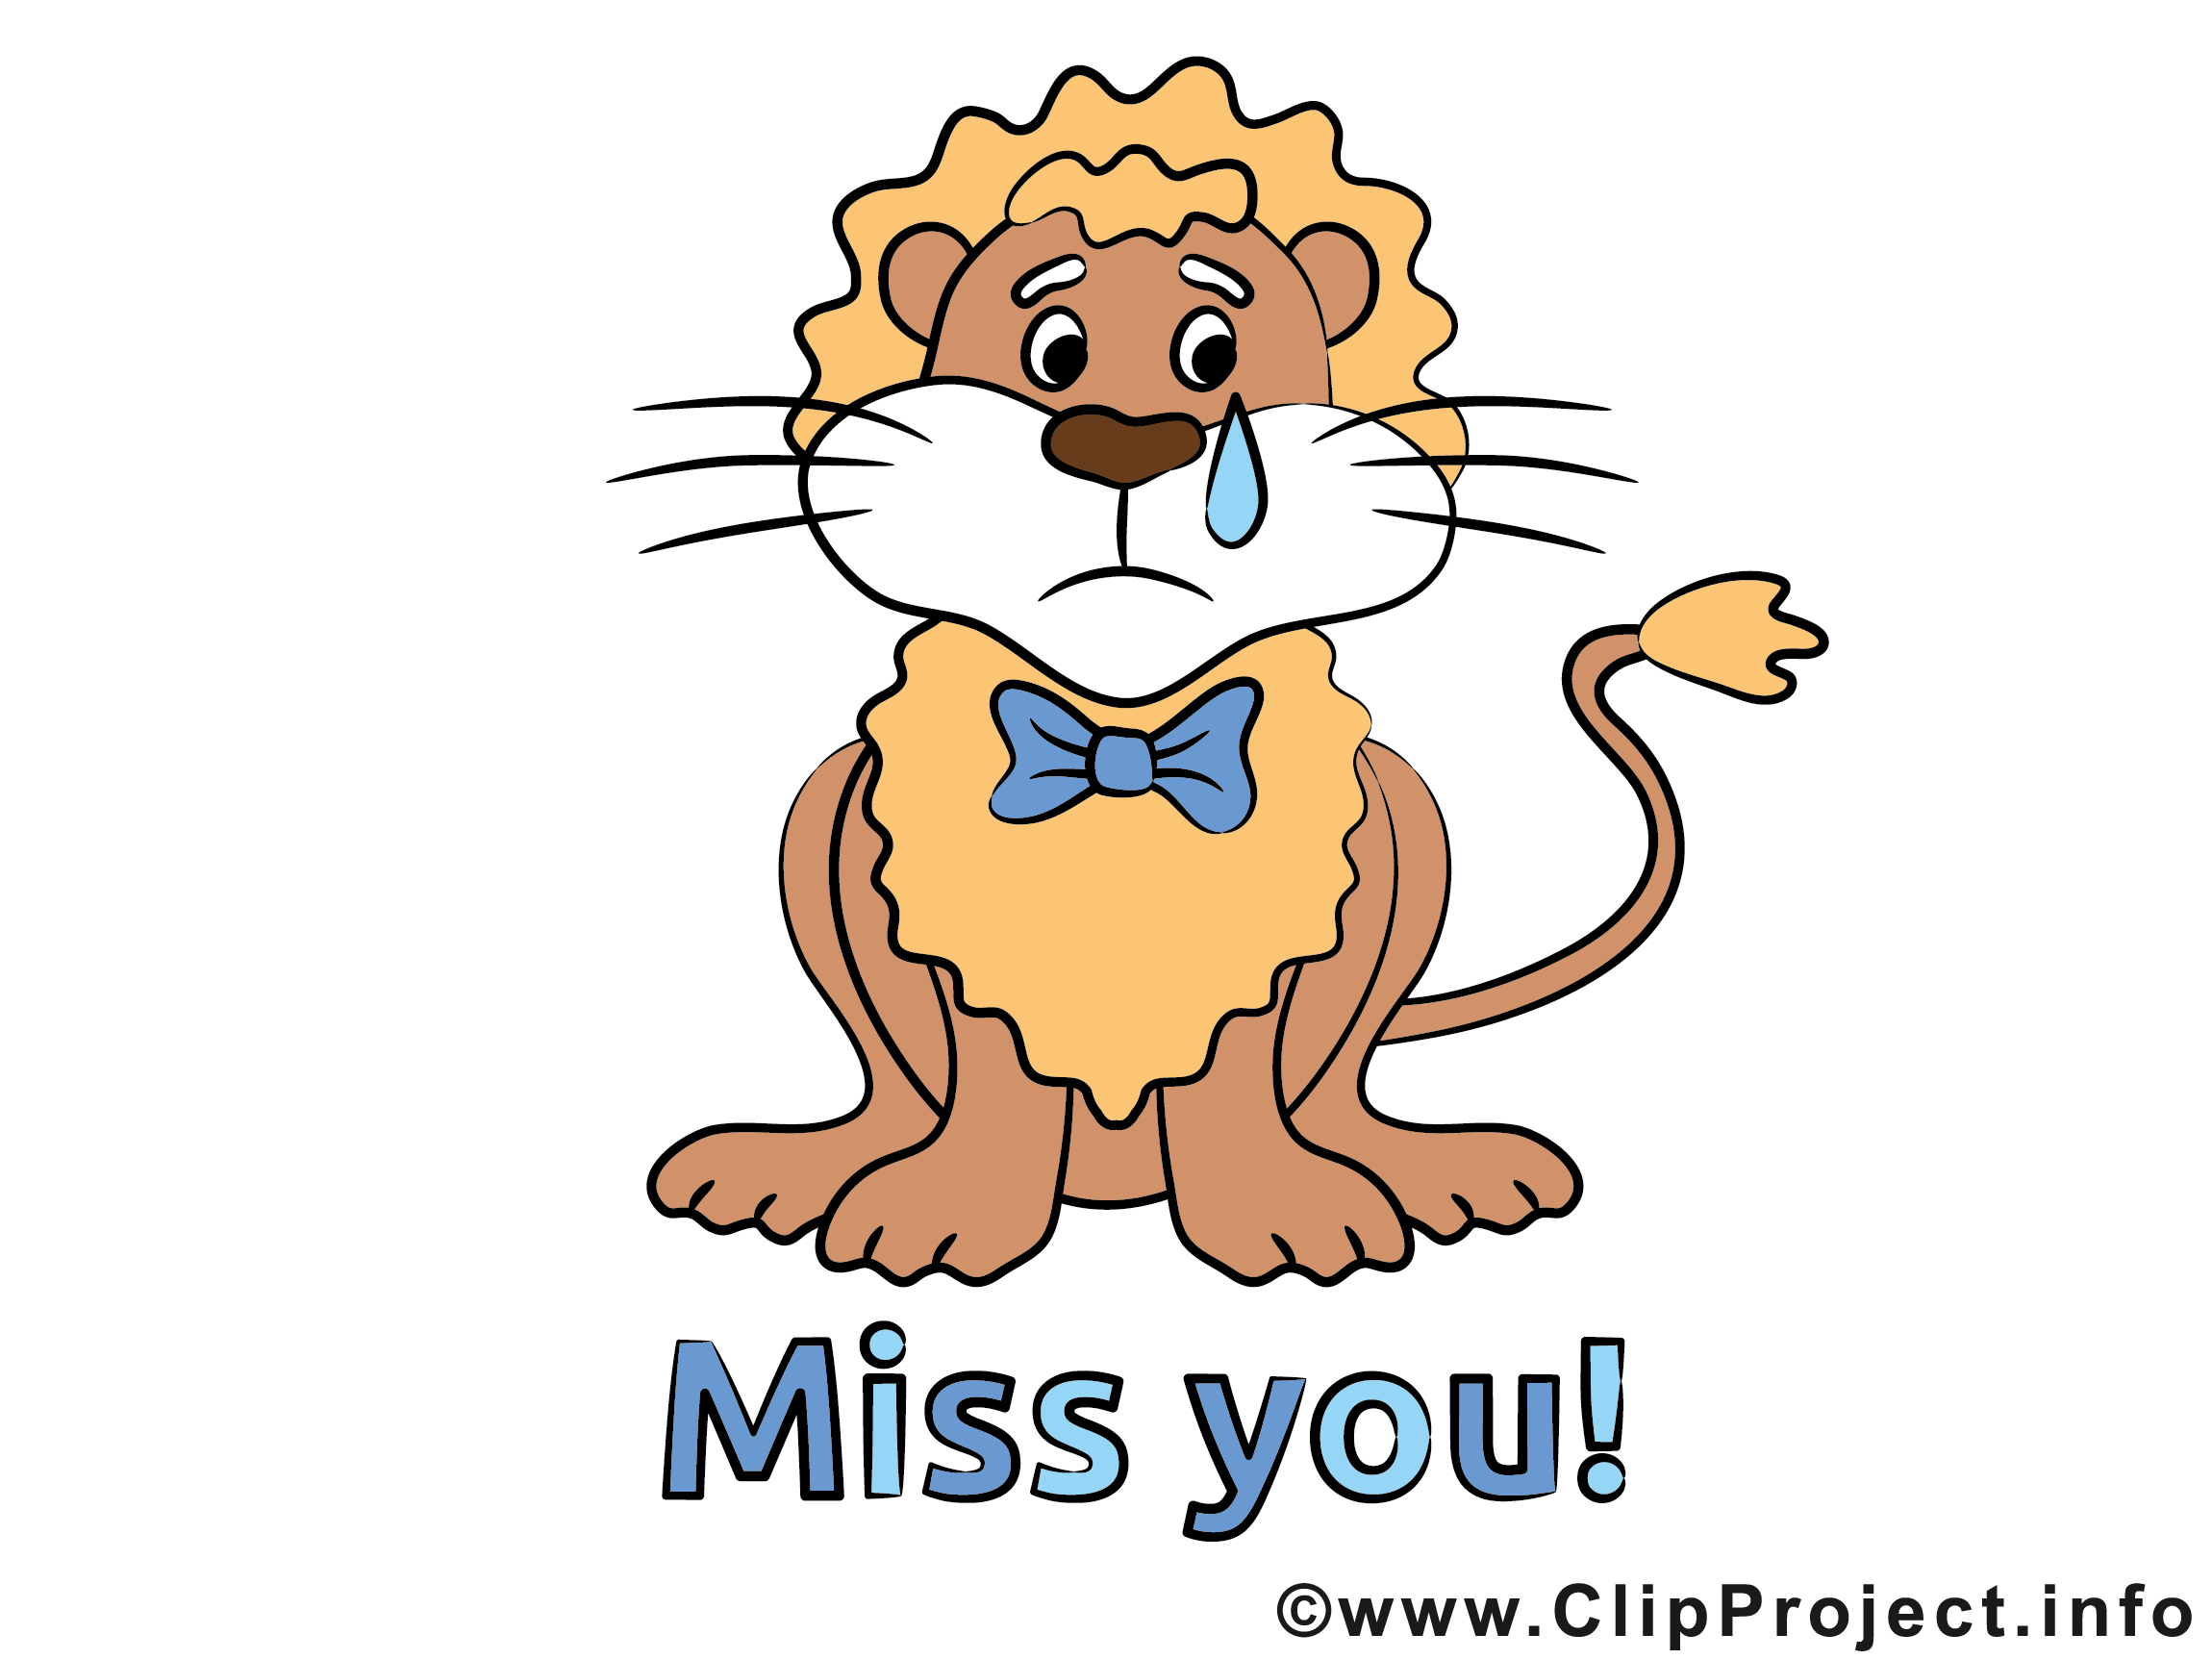 Miss you Loewe Clipart